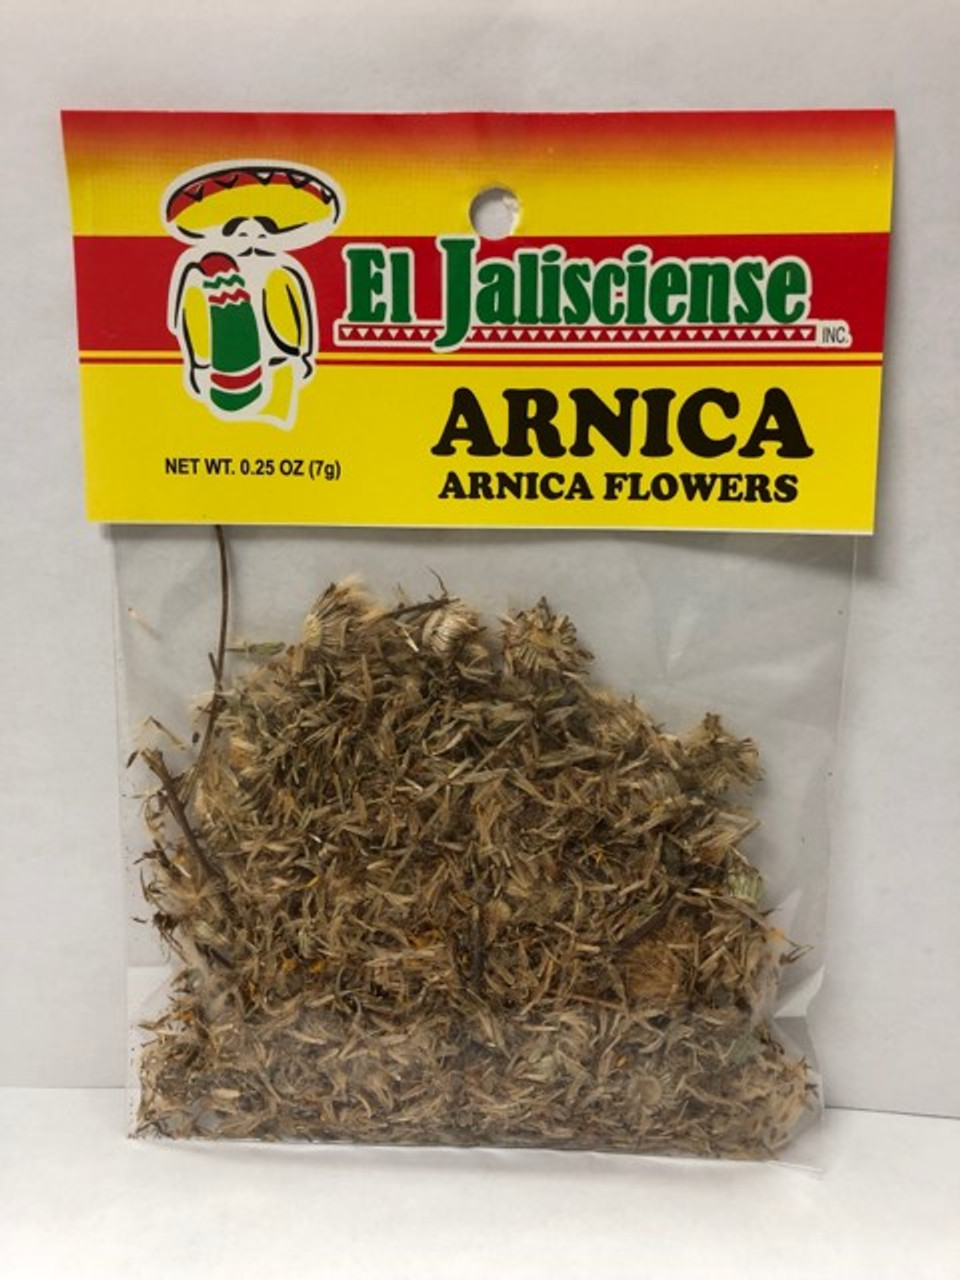 El Jalisciense Arnica Single Bag .25oz